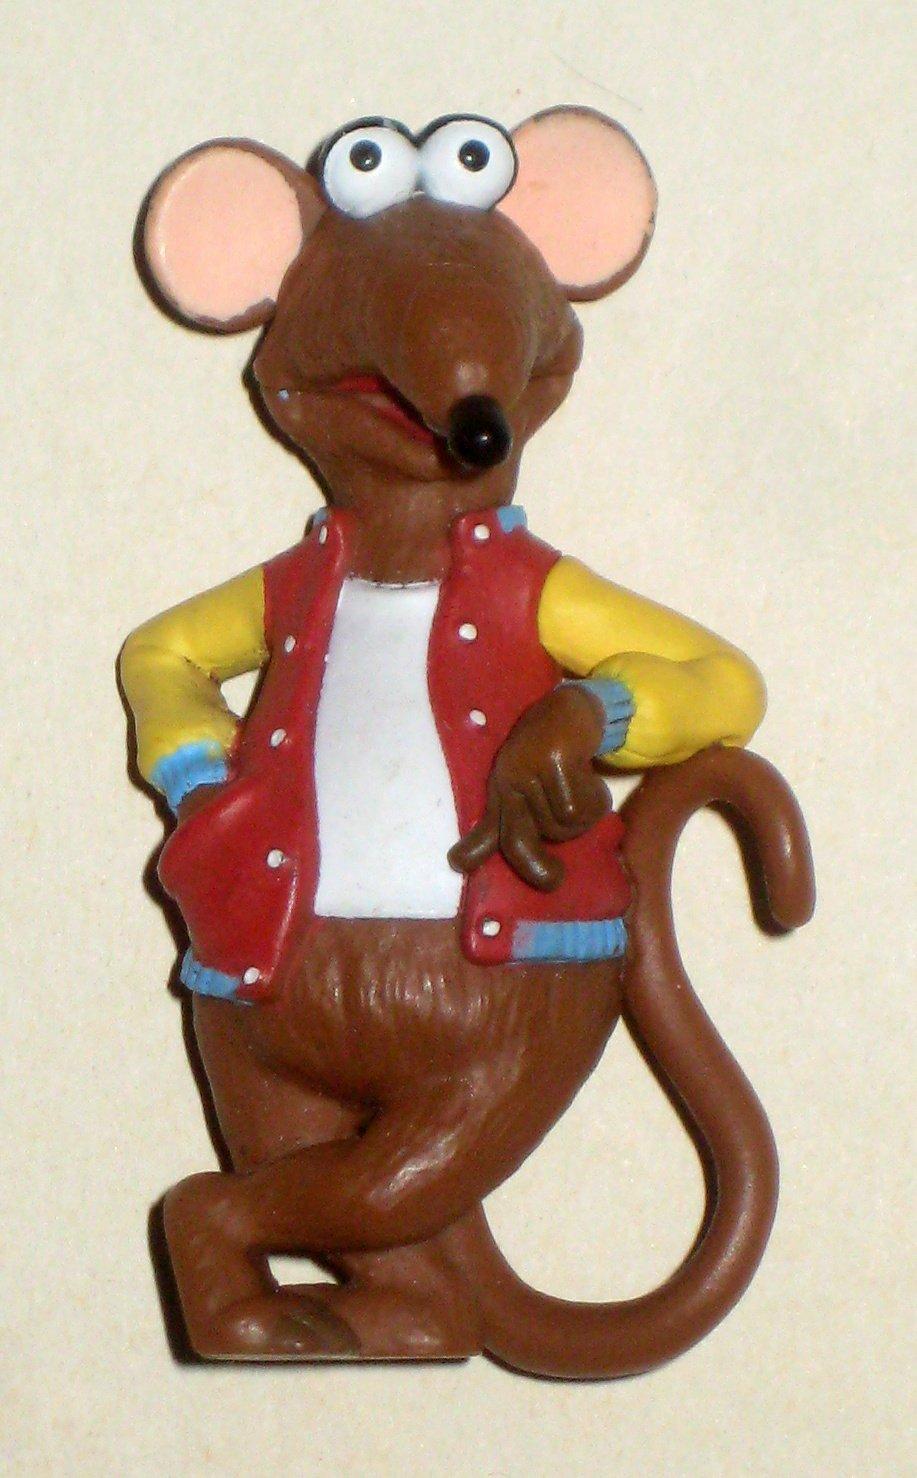 SOLD Rizzo 2 14 Inch PVC Plastic Figure Mouse Rat Muppets Sesame Street Jim Henson